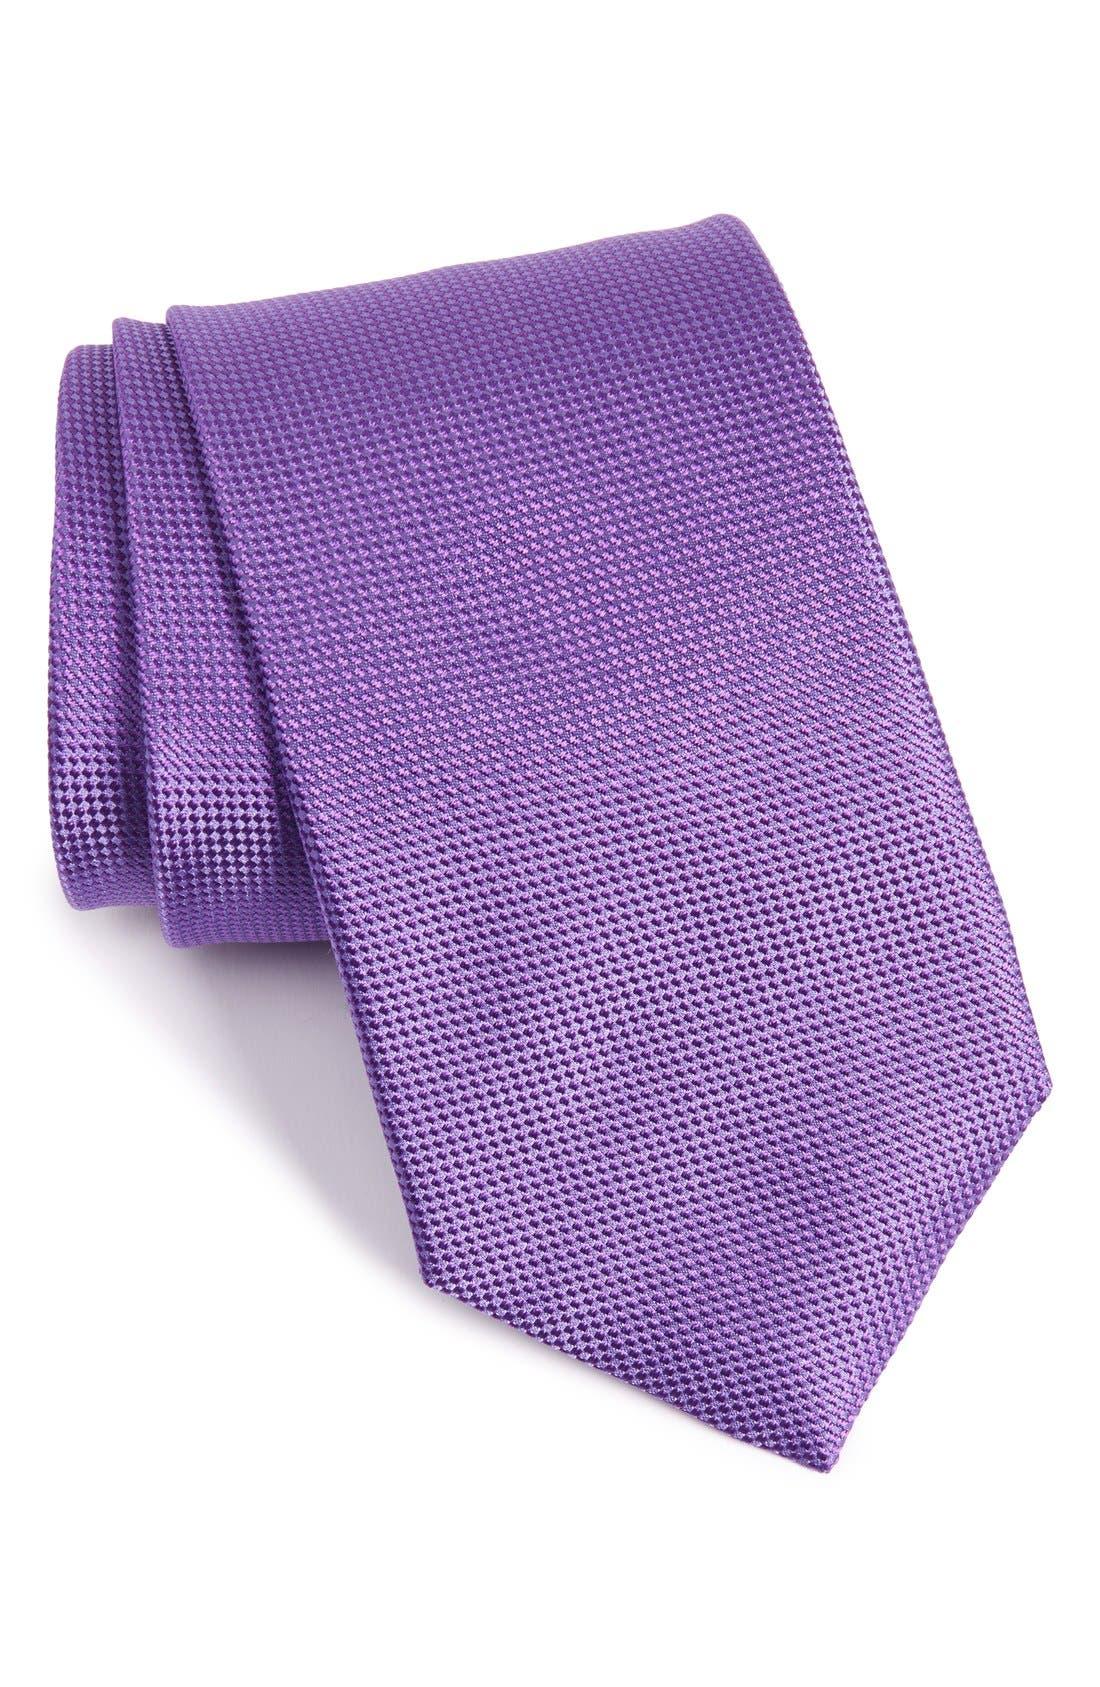 John W. Nordstrom® 'Ryder' Silk Tie